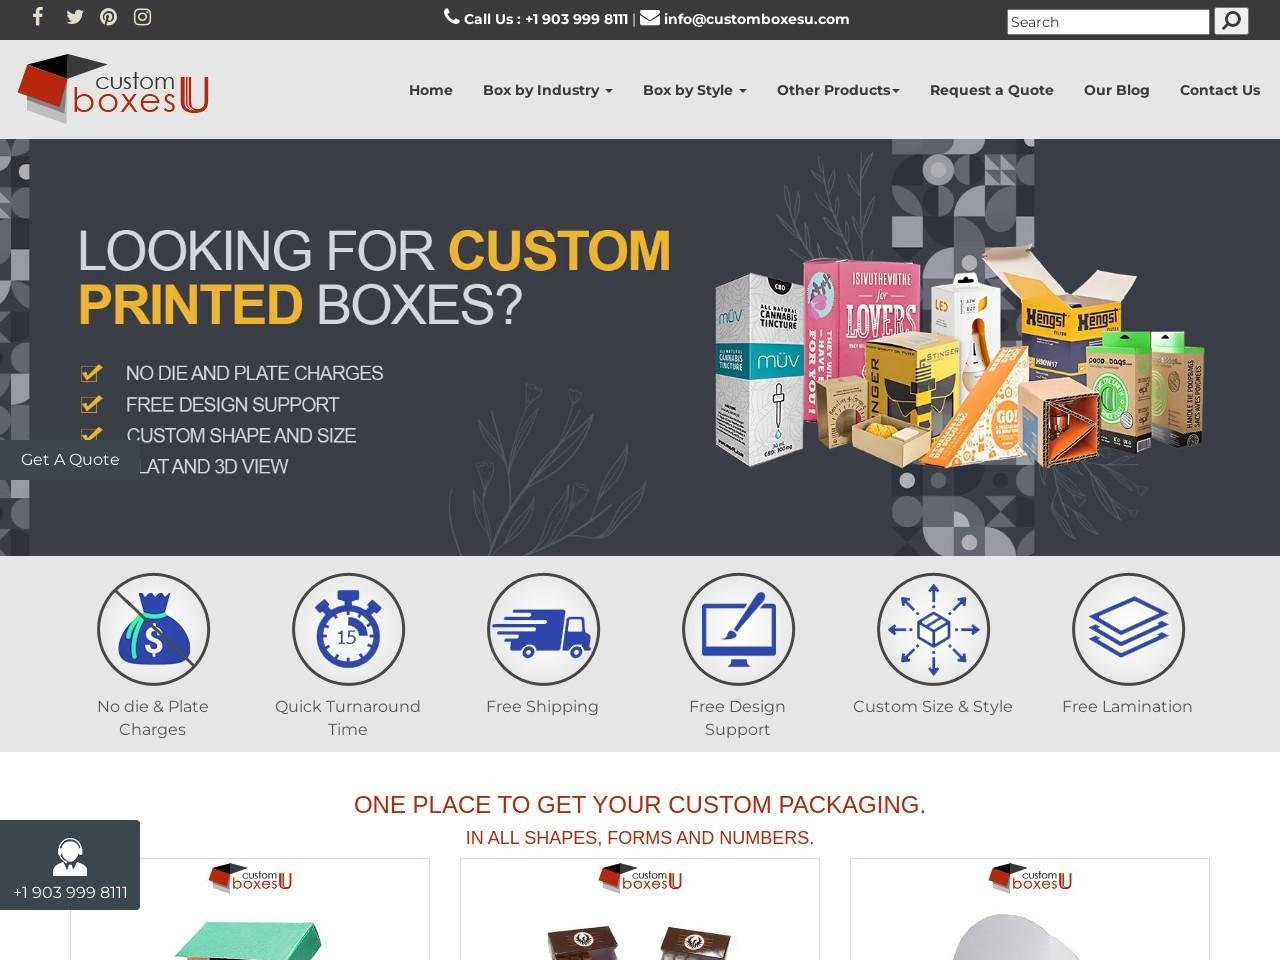 Custom Boxes california with Printed logo & Design